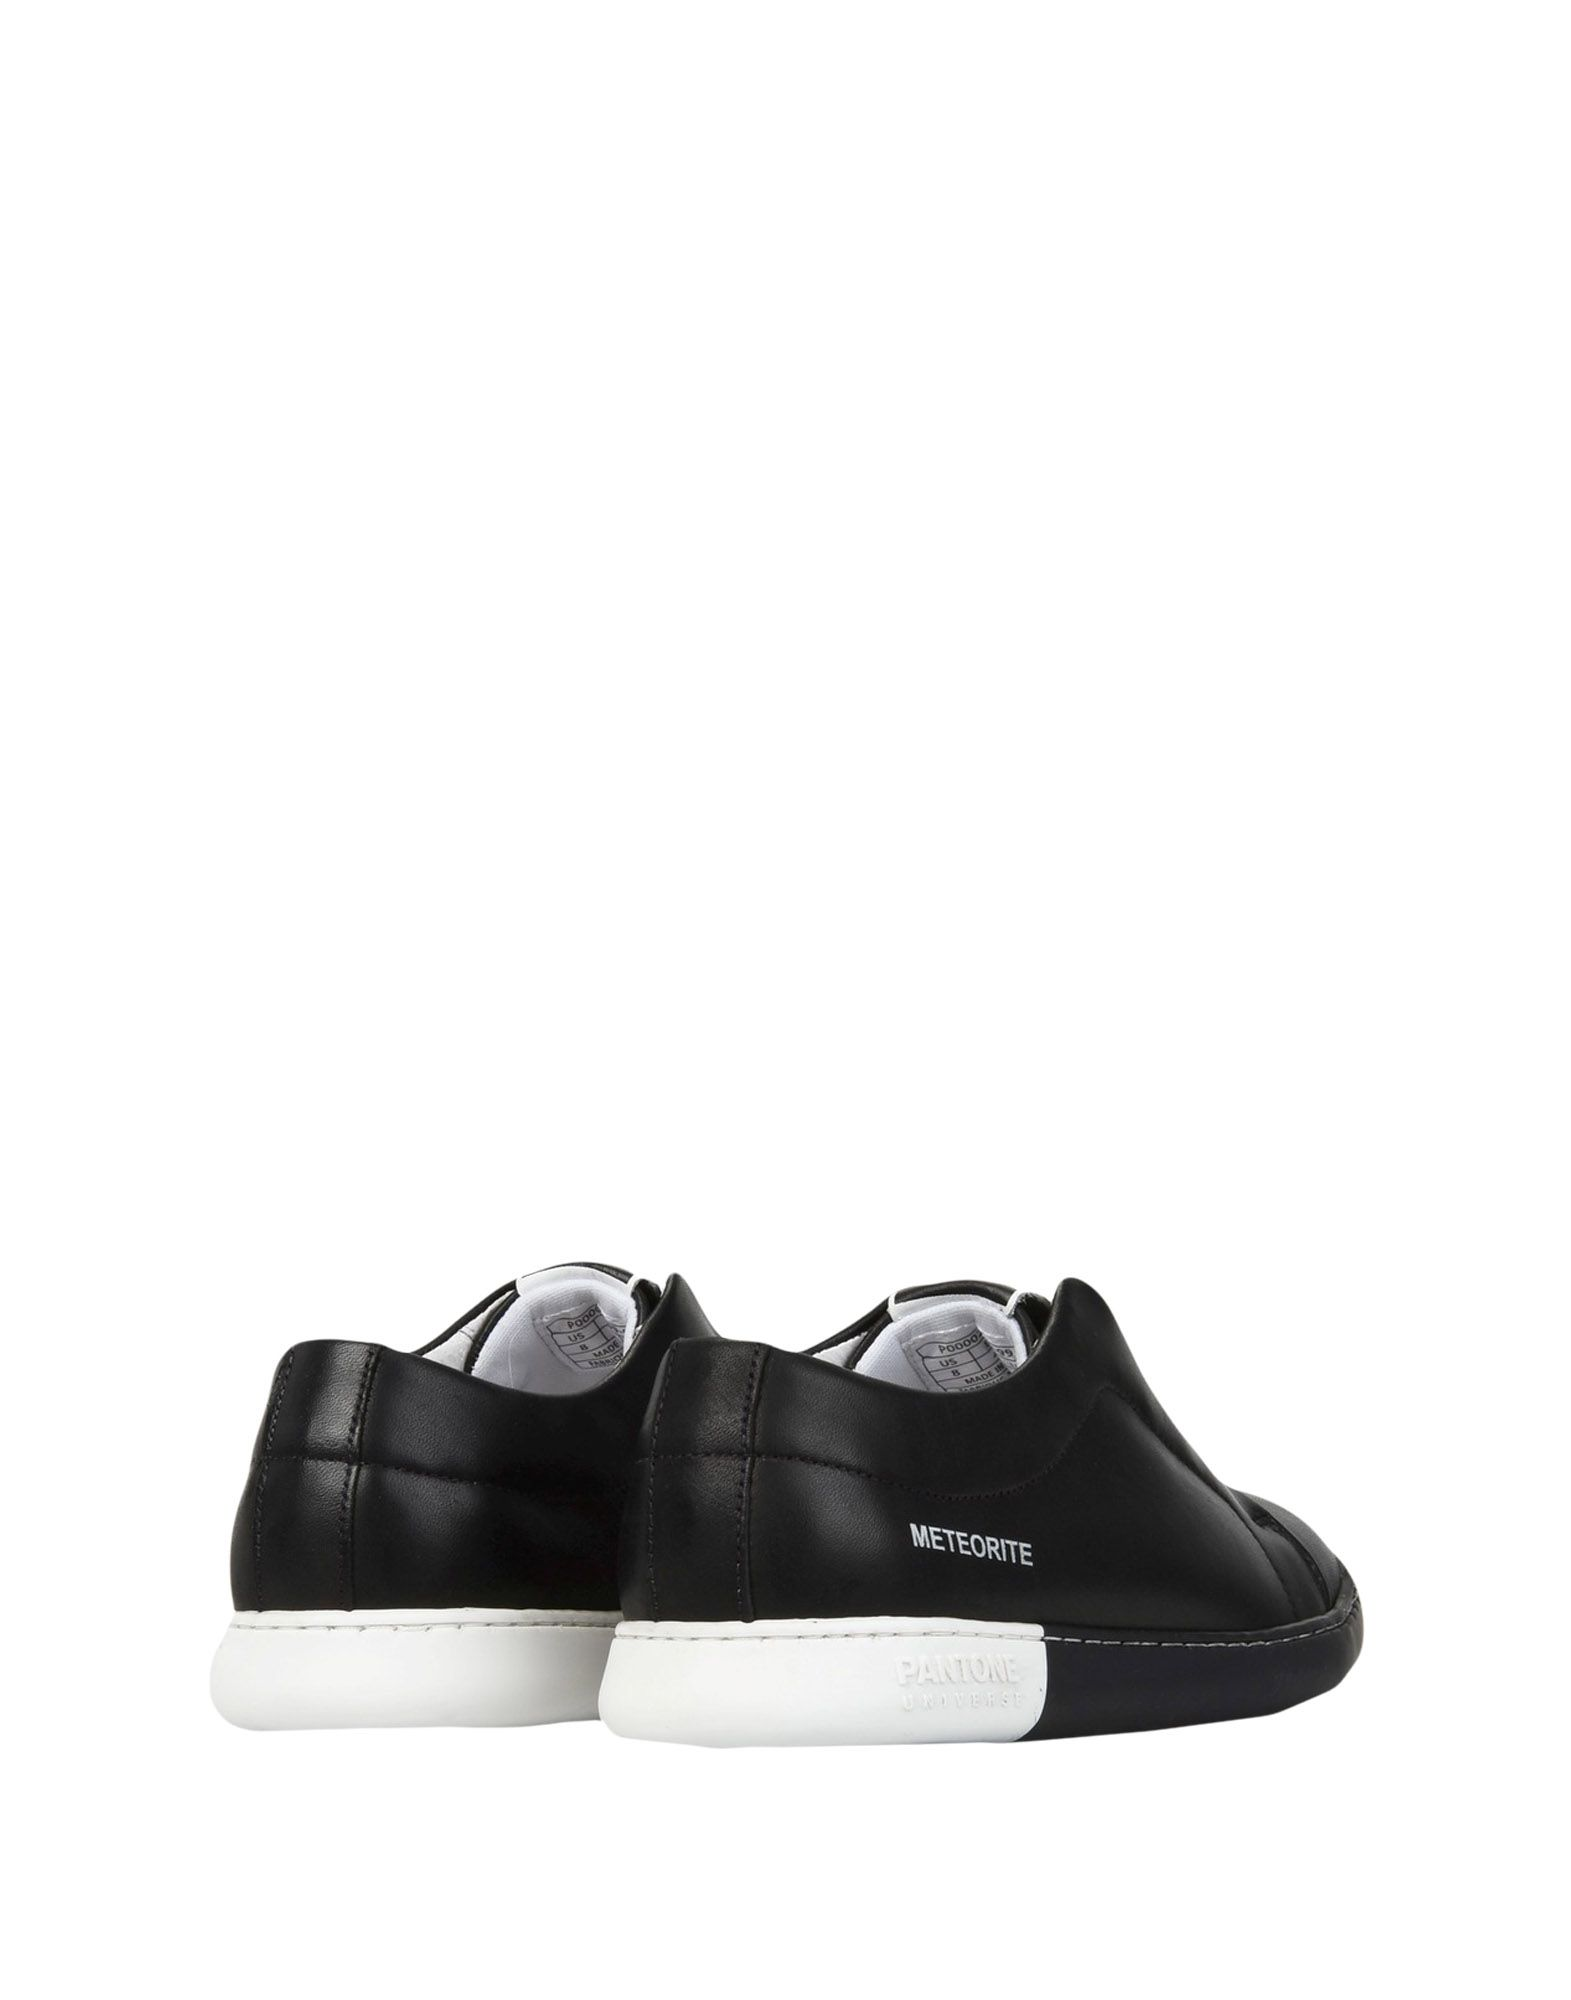 Sneakers Pantone Universe Footwear Usa Open Leather - Femme - Sneakers Pantone Universe Footwear sur